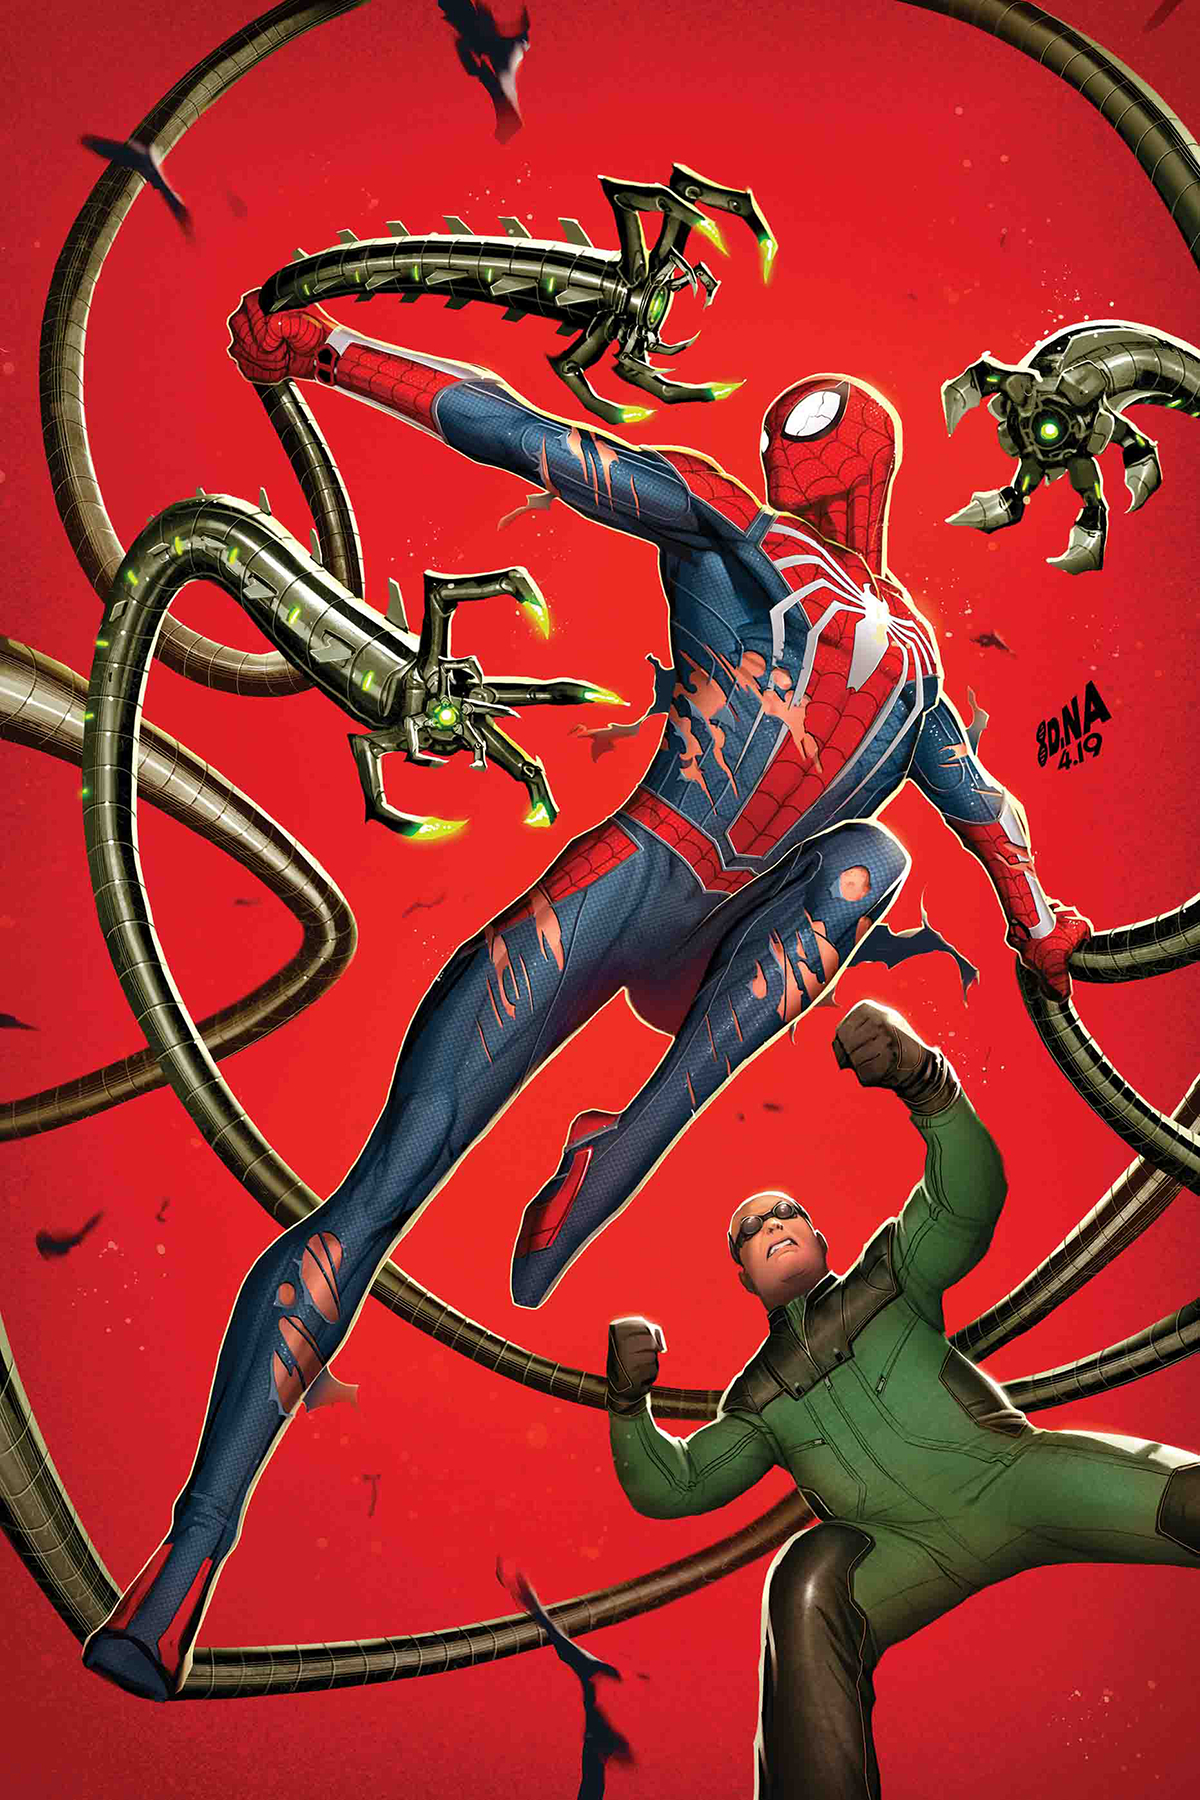 Marvel Comics 2019 Spider-Man City at War #6 of 6